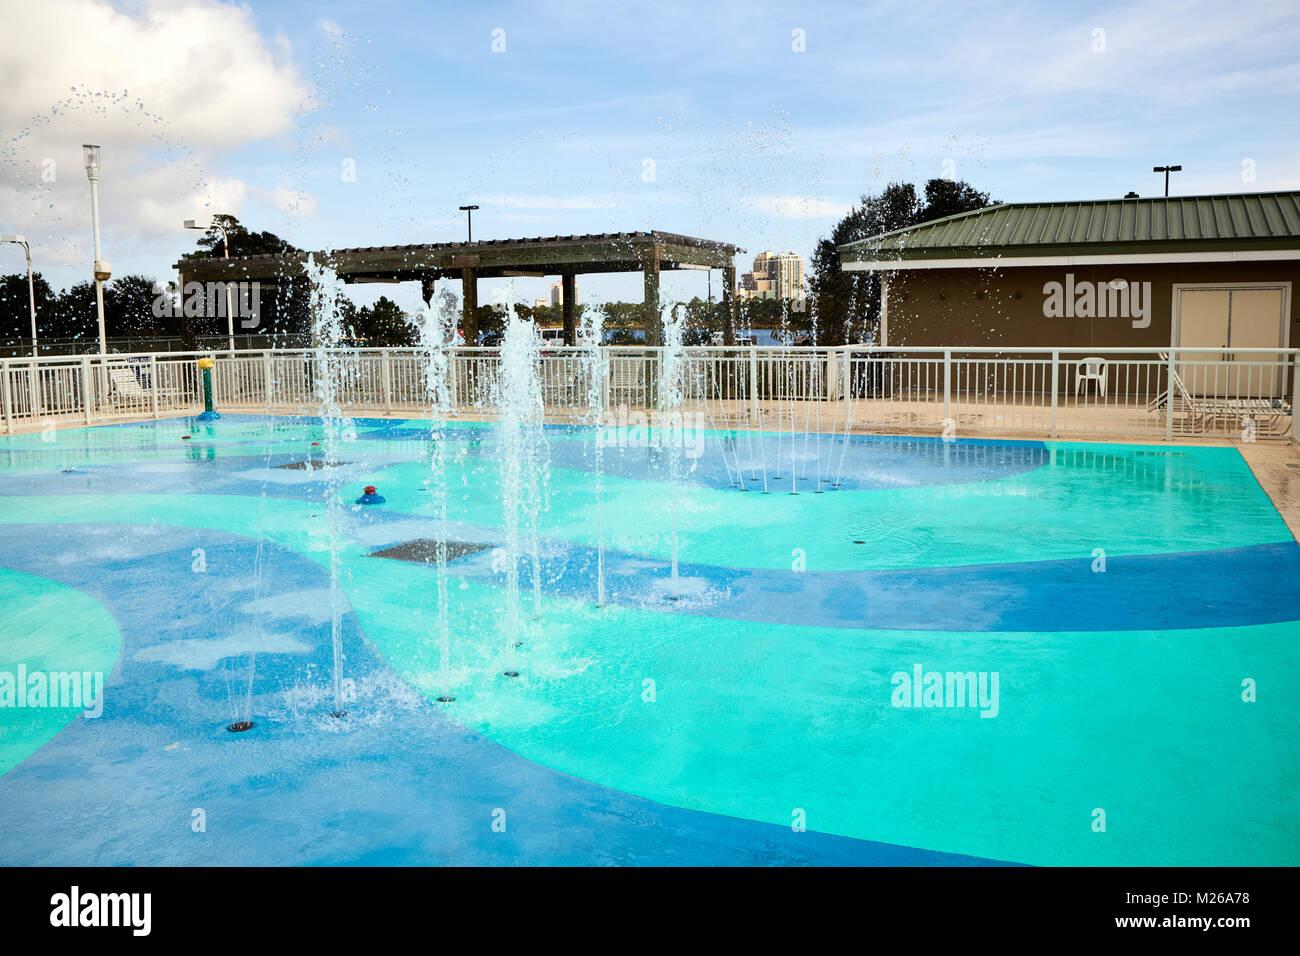 Splash Pad at Gulf State Park, Alabama Stock Photo